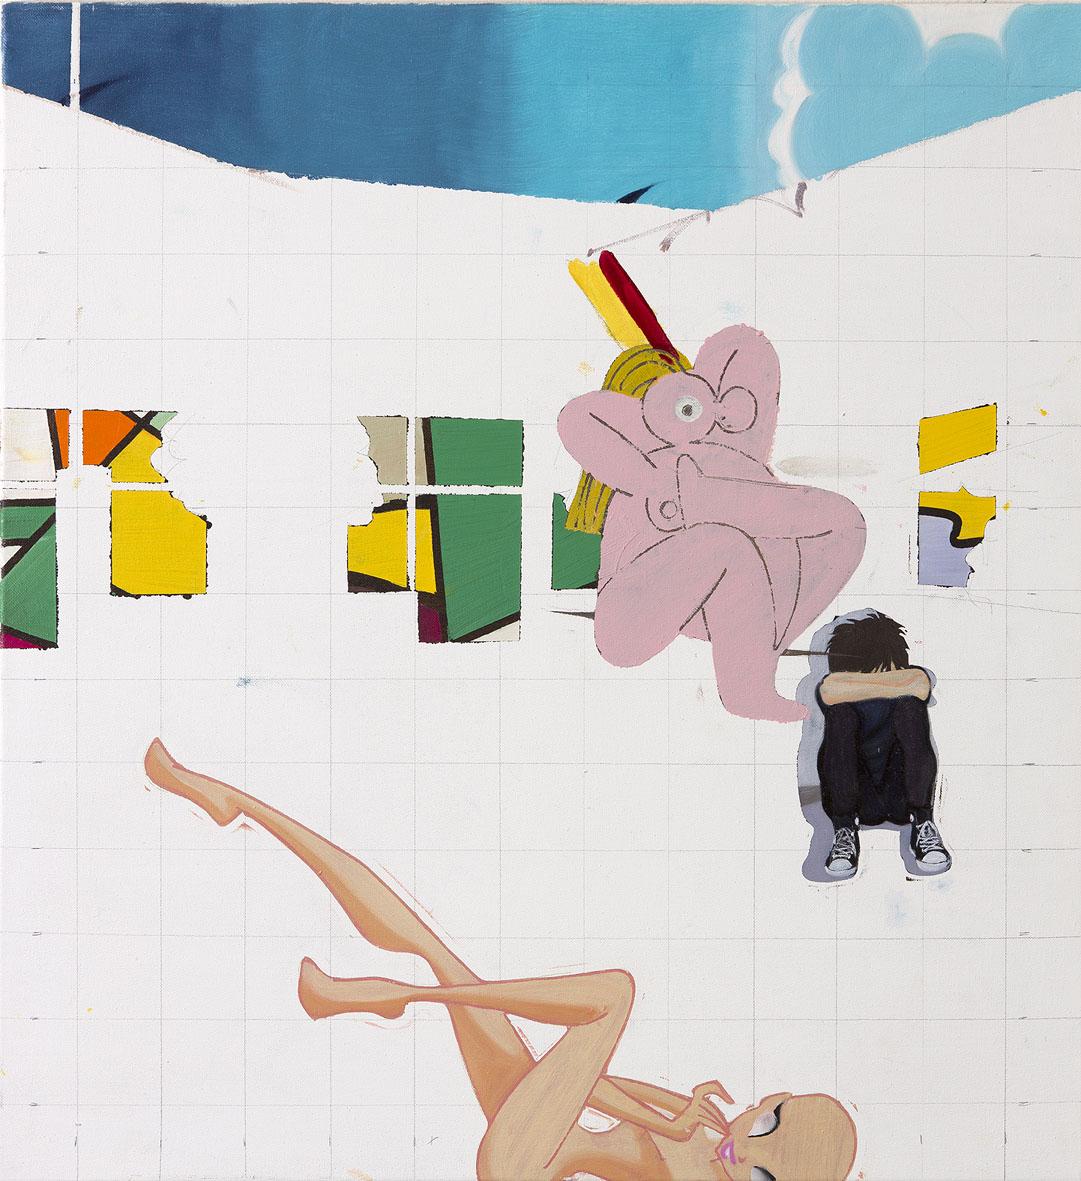 Georg Frauenschuh. ohne Titel (stained glass), 2020, Öl/Lw., 70 x 65 cm